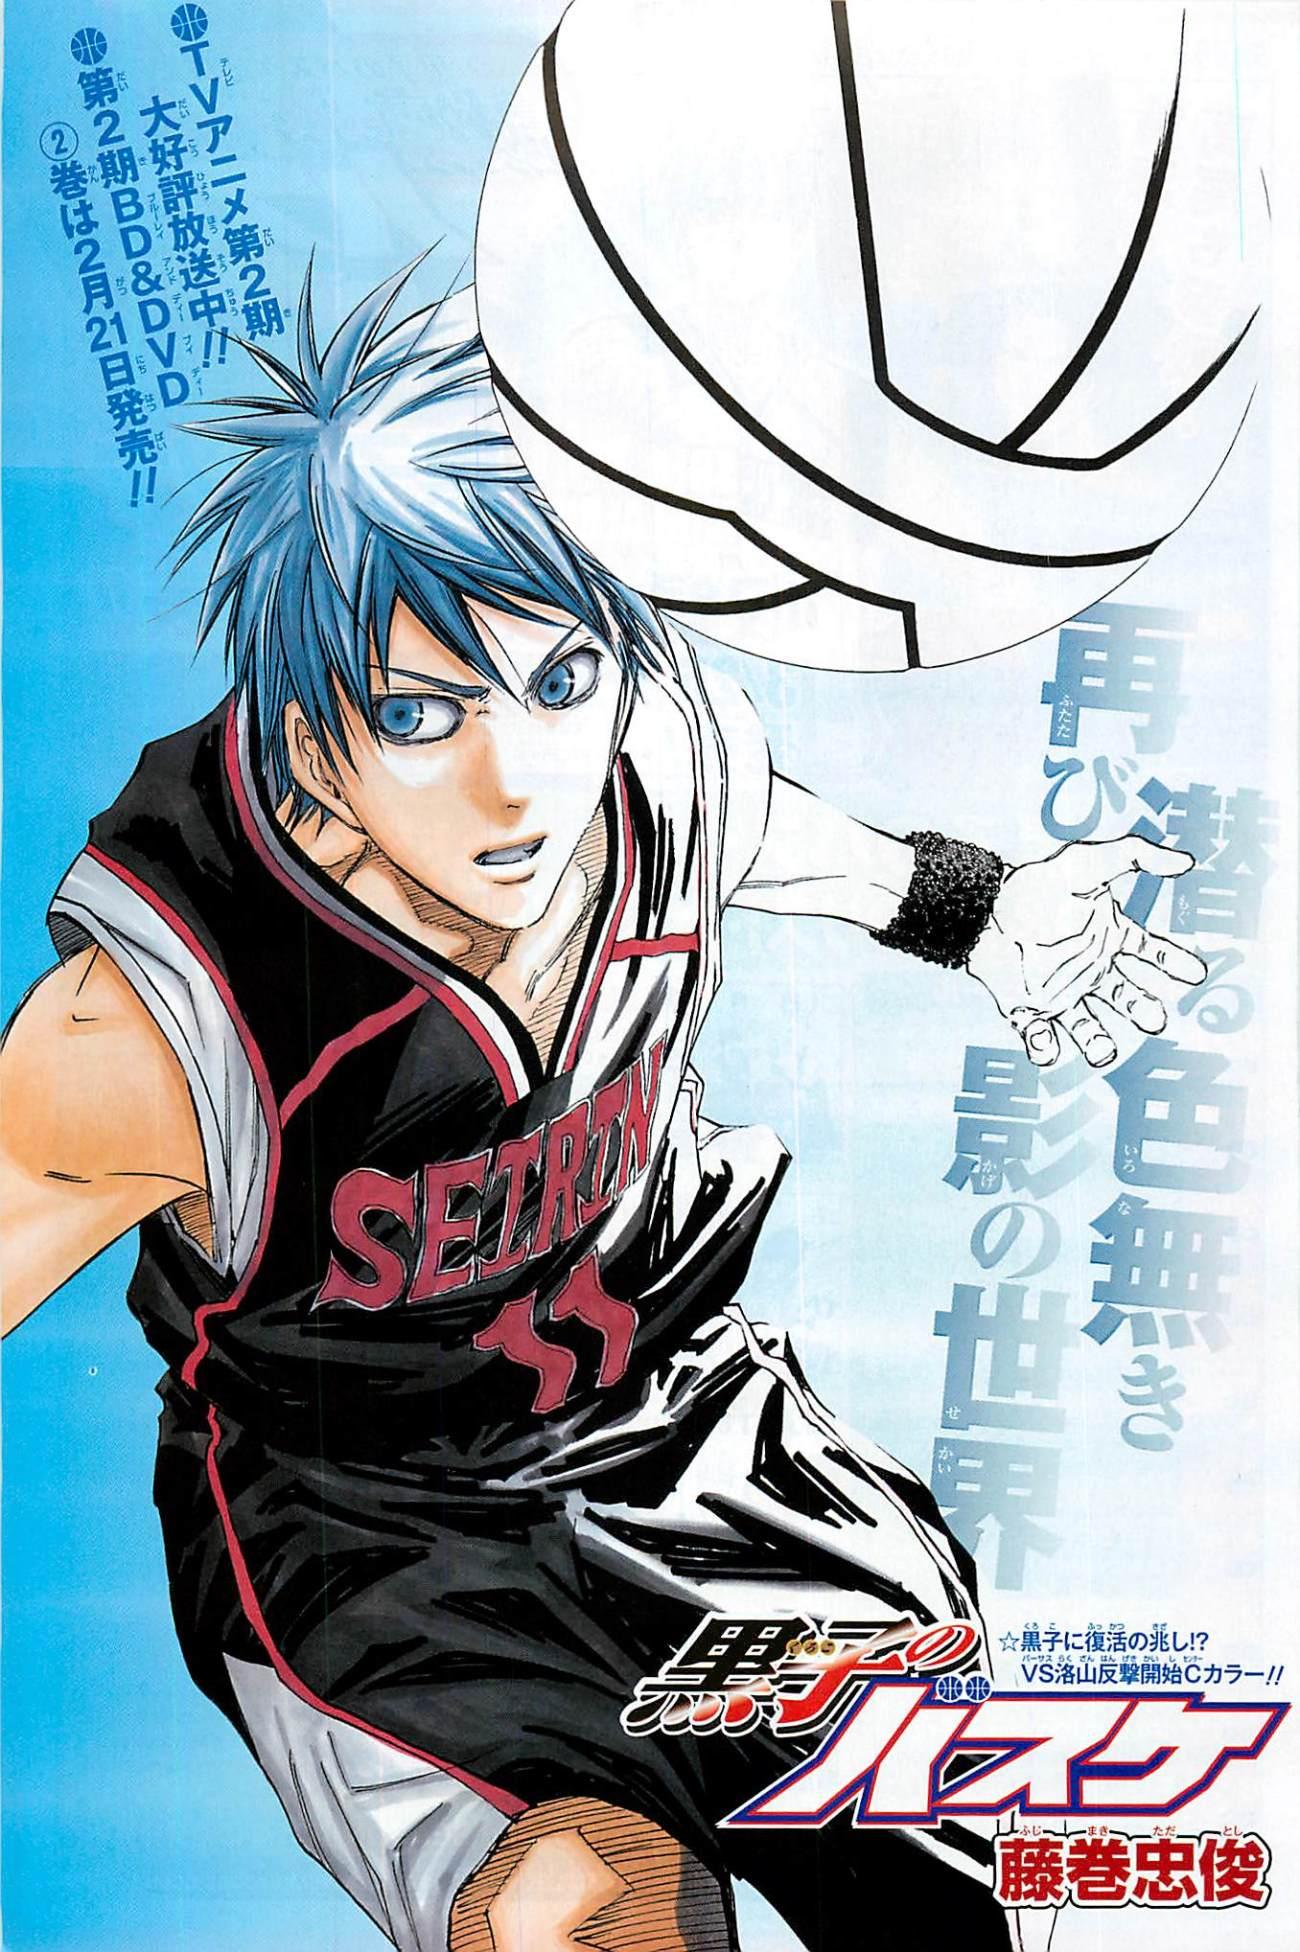 Weekly Shonen Jump 12 2014 Kuroro No Basket Page couleur